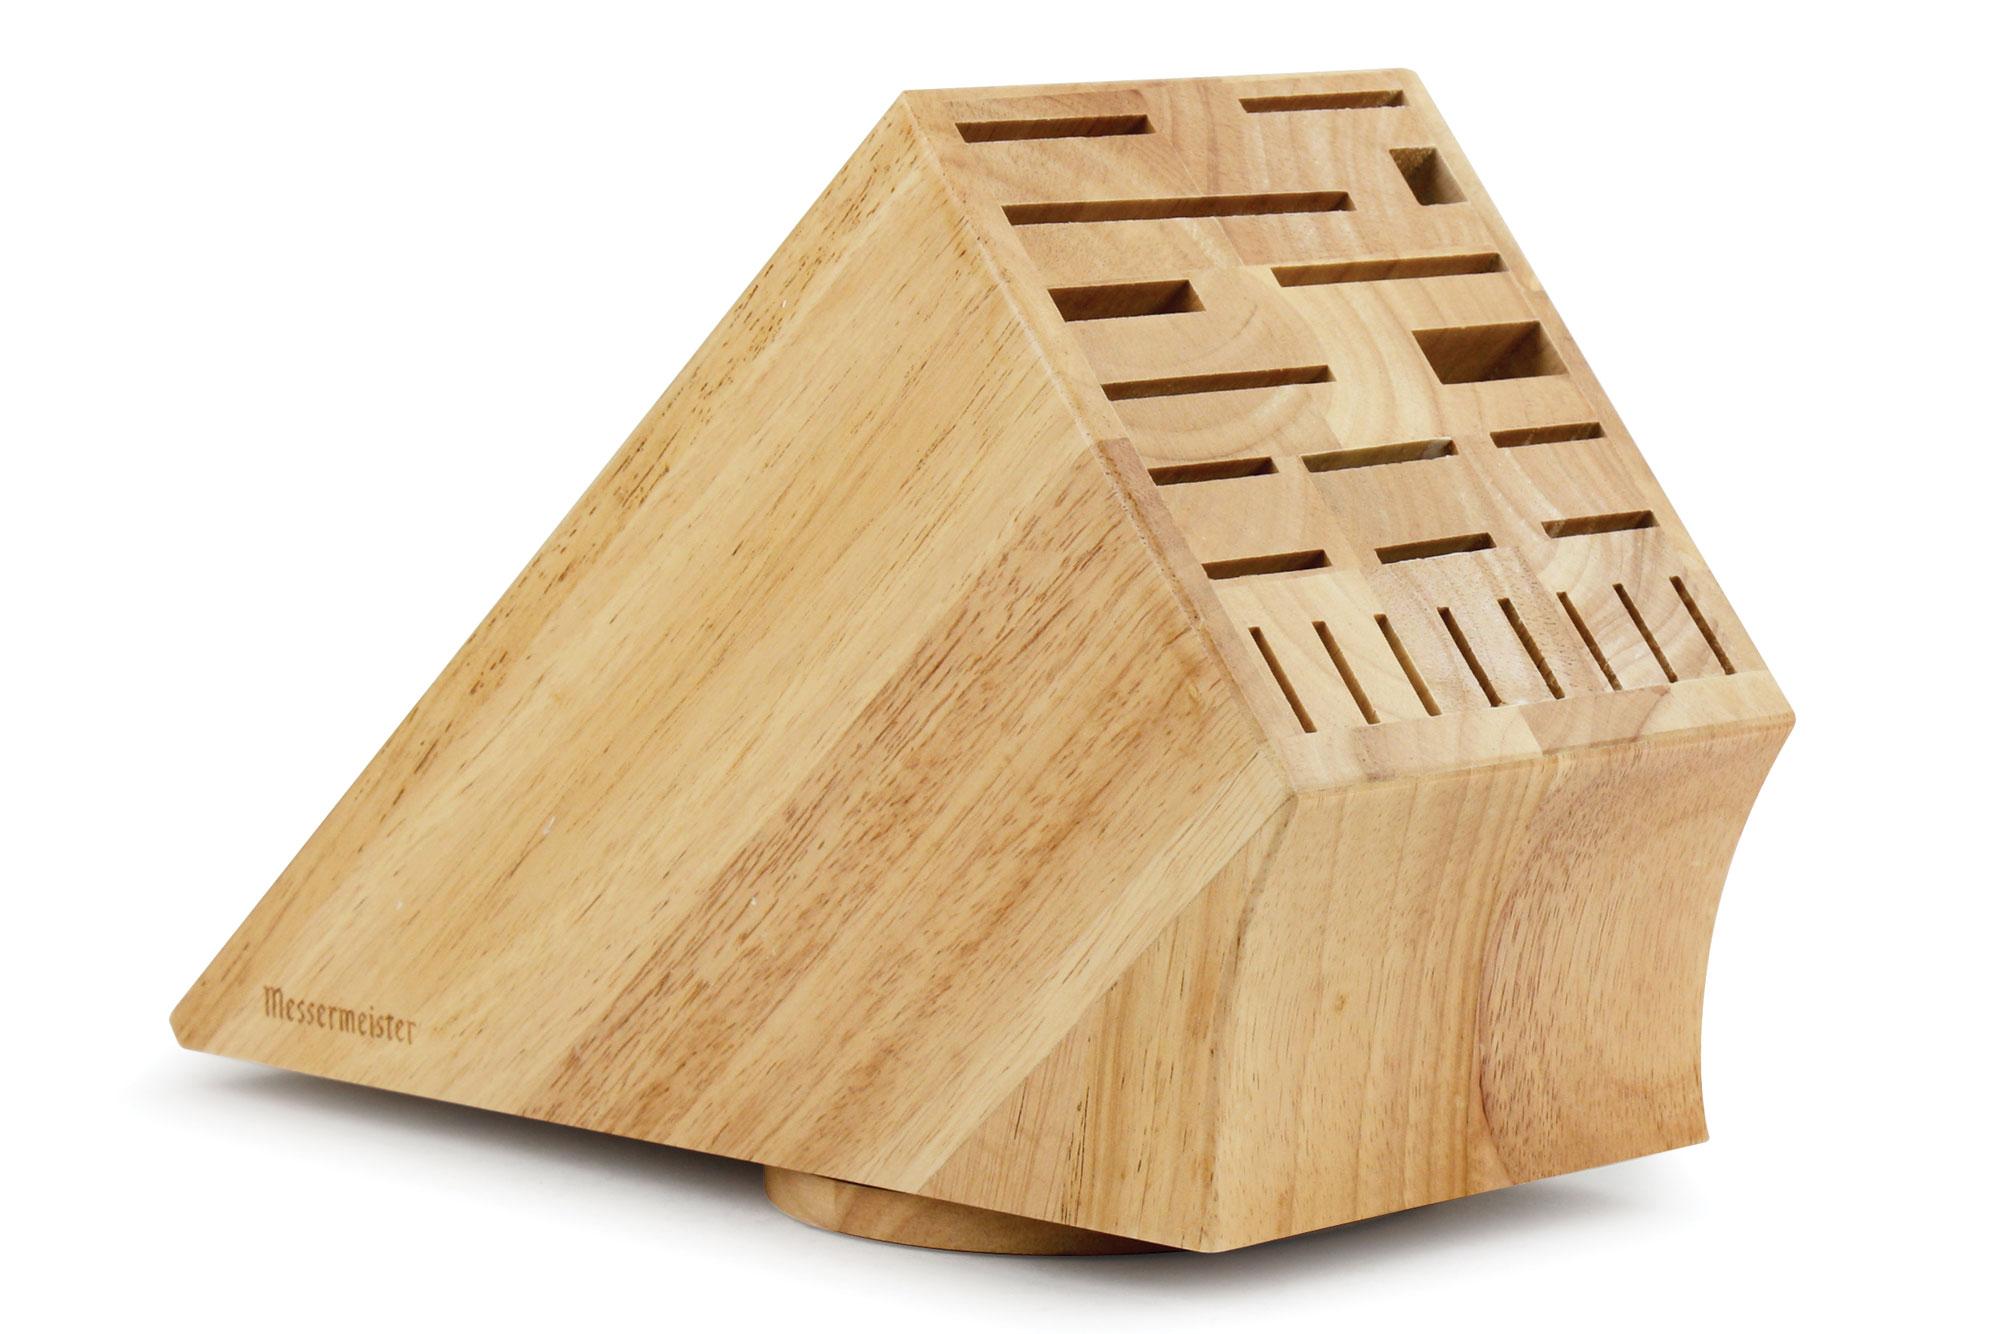 Messermeister Natural Wood Swivel Knife Block 22 Slot